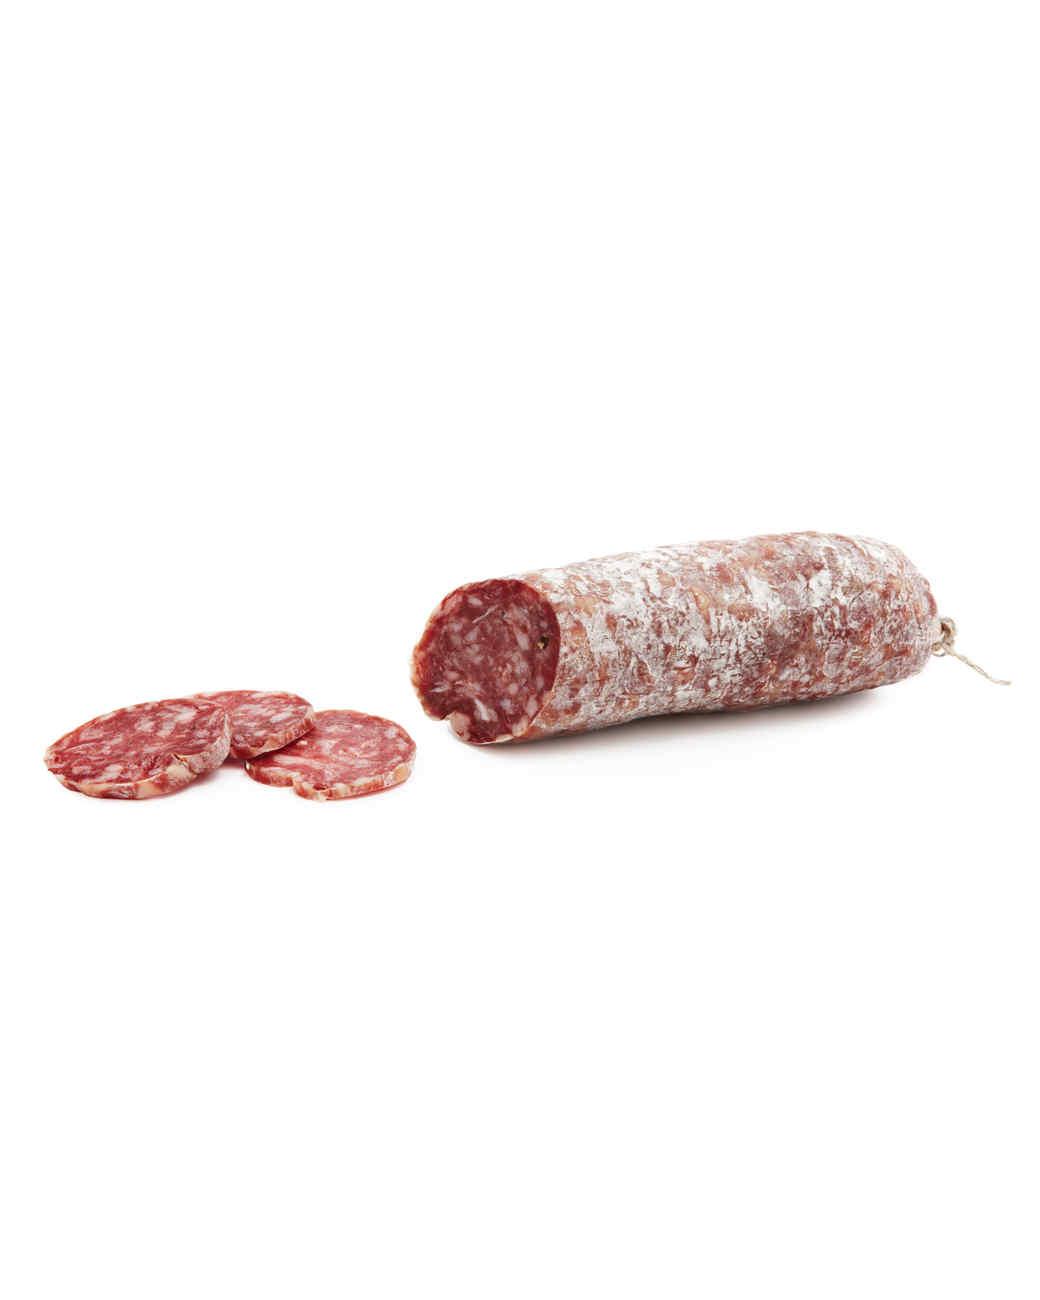 easy-entertaining-jk-sausage-msl-d108975.jpg